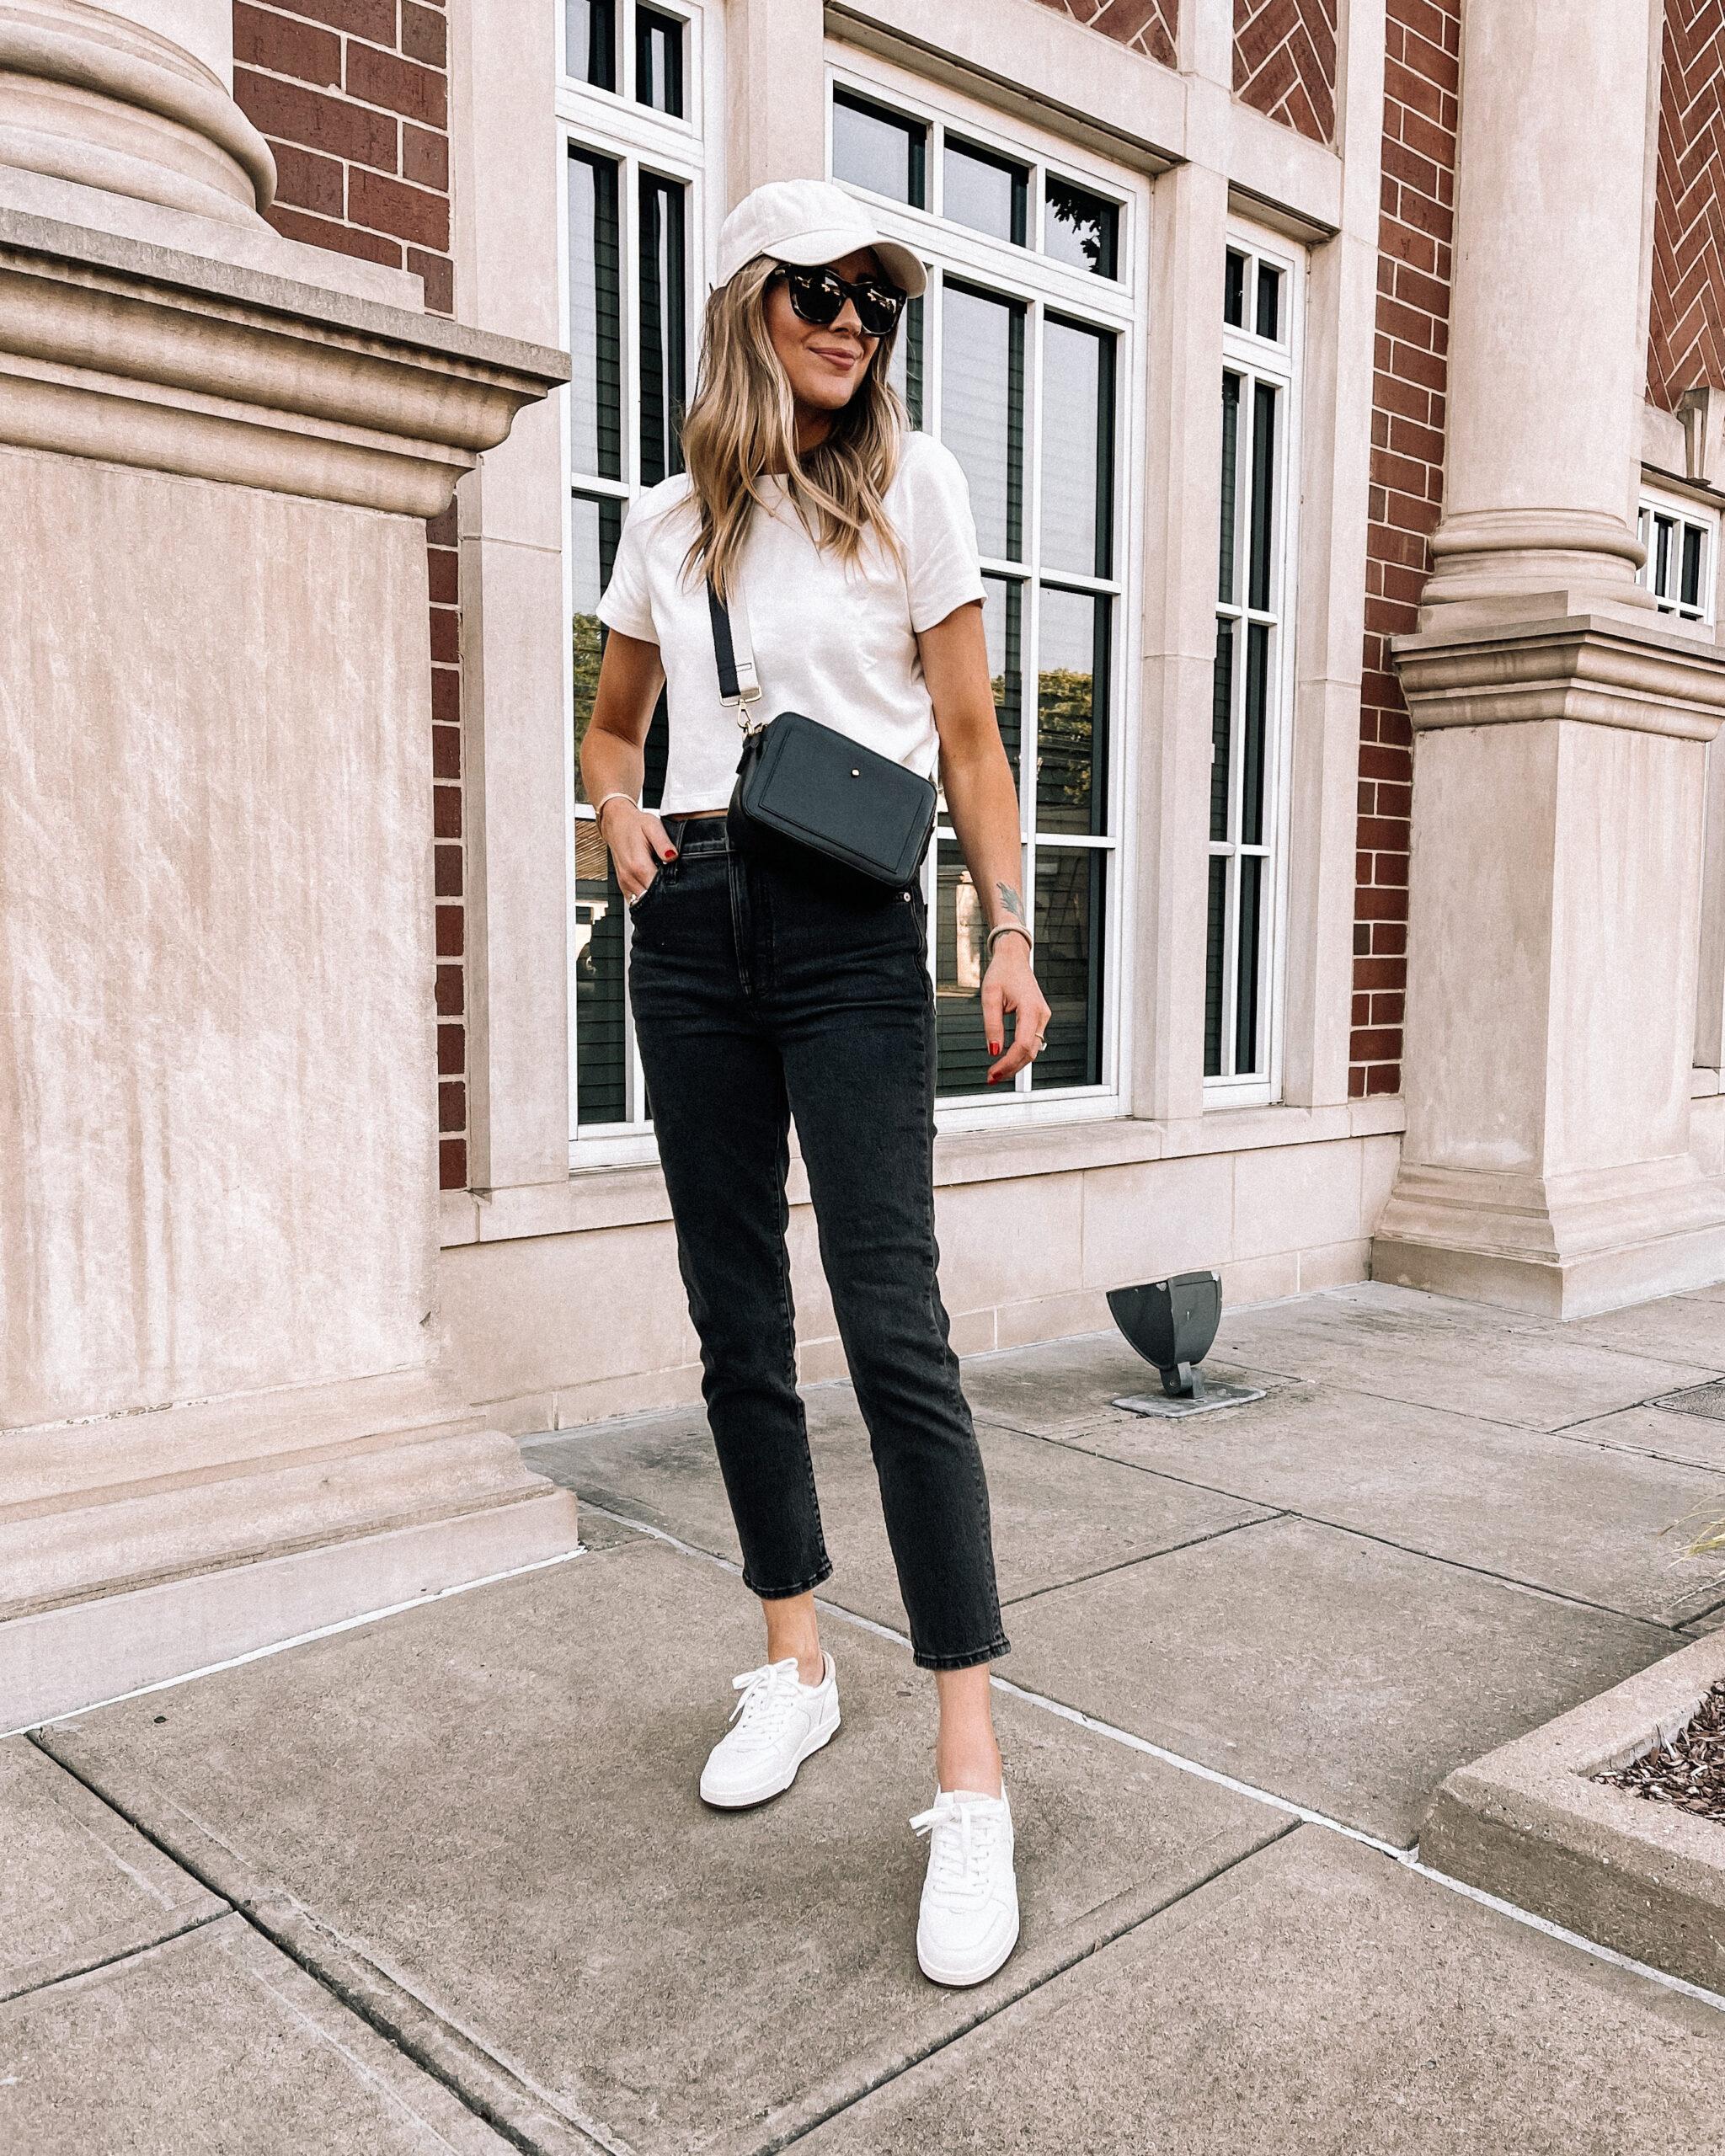 Fashion Jackson Wearing Madewell White Tshirt Black Jeans White Baseball Hat White Sneakers Black Crossbody Handbag